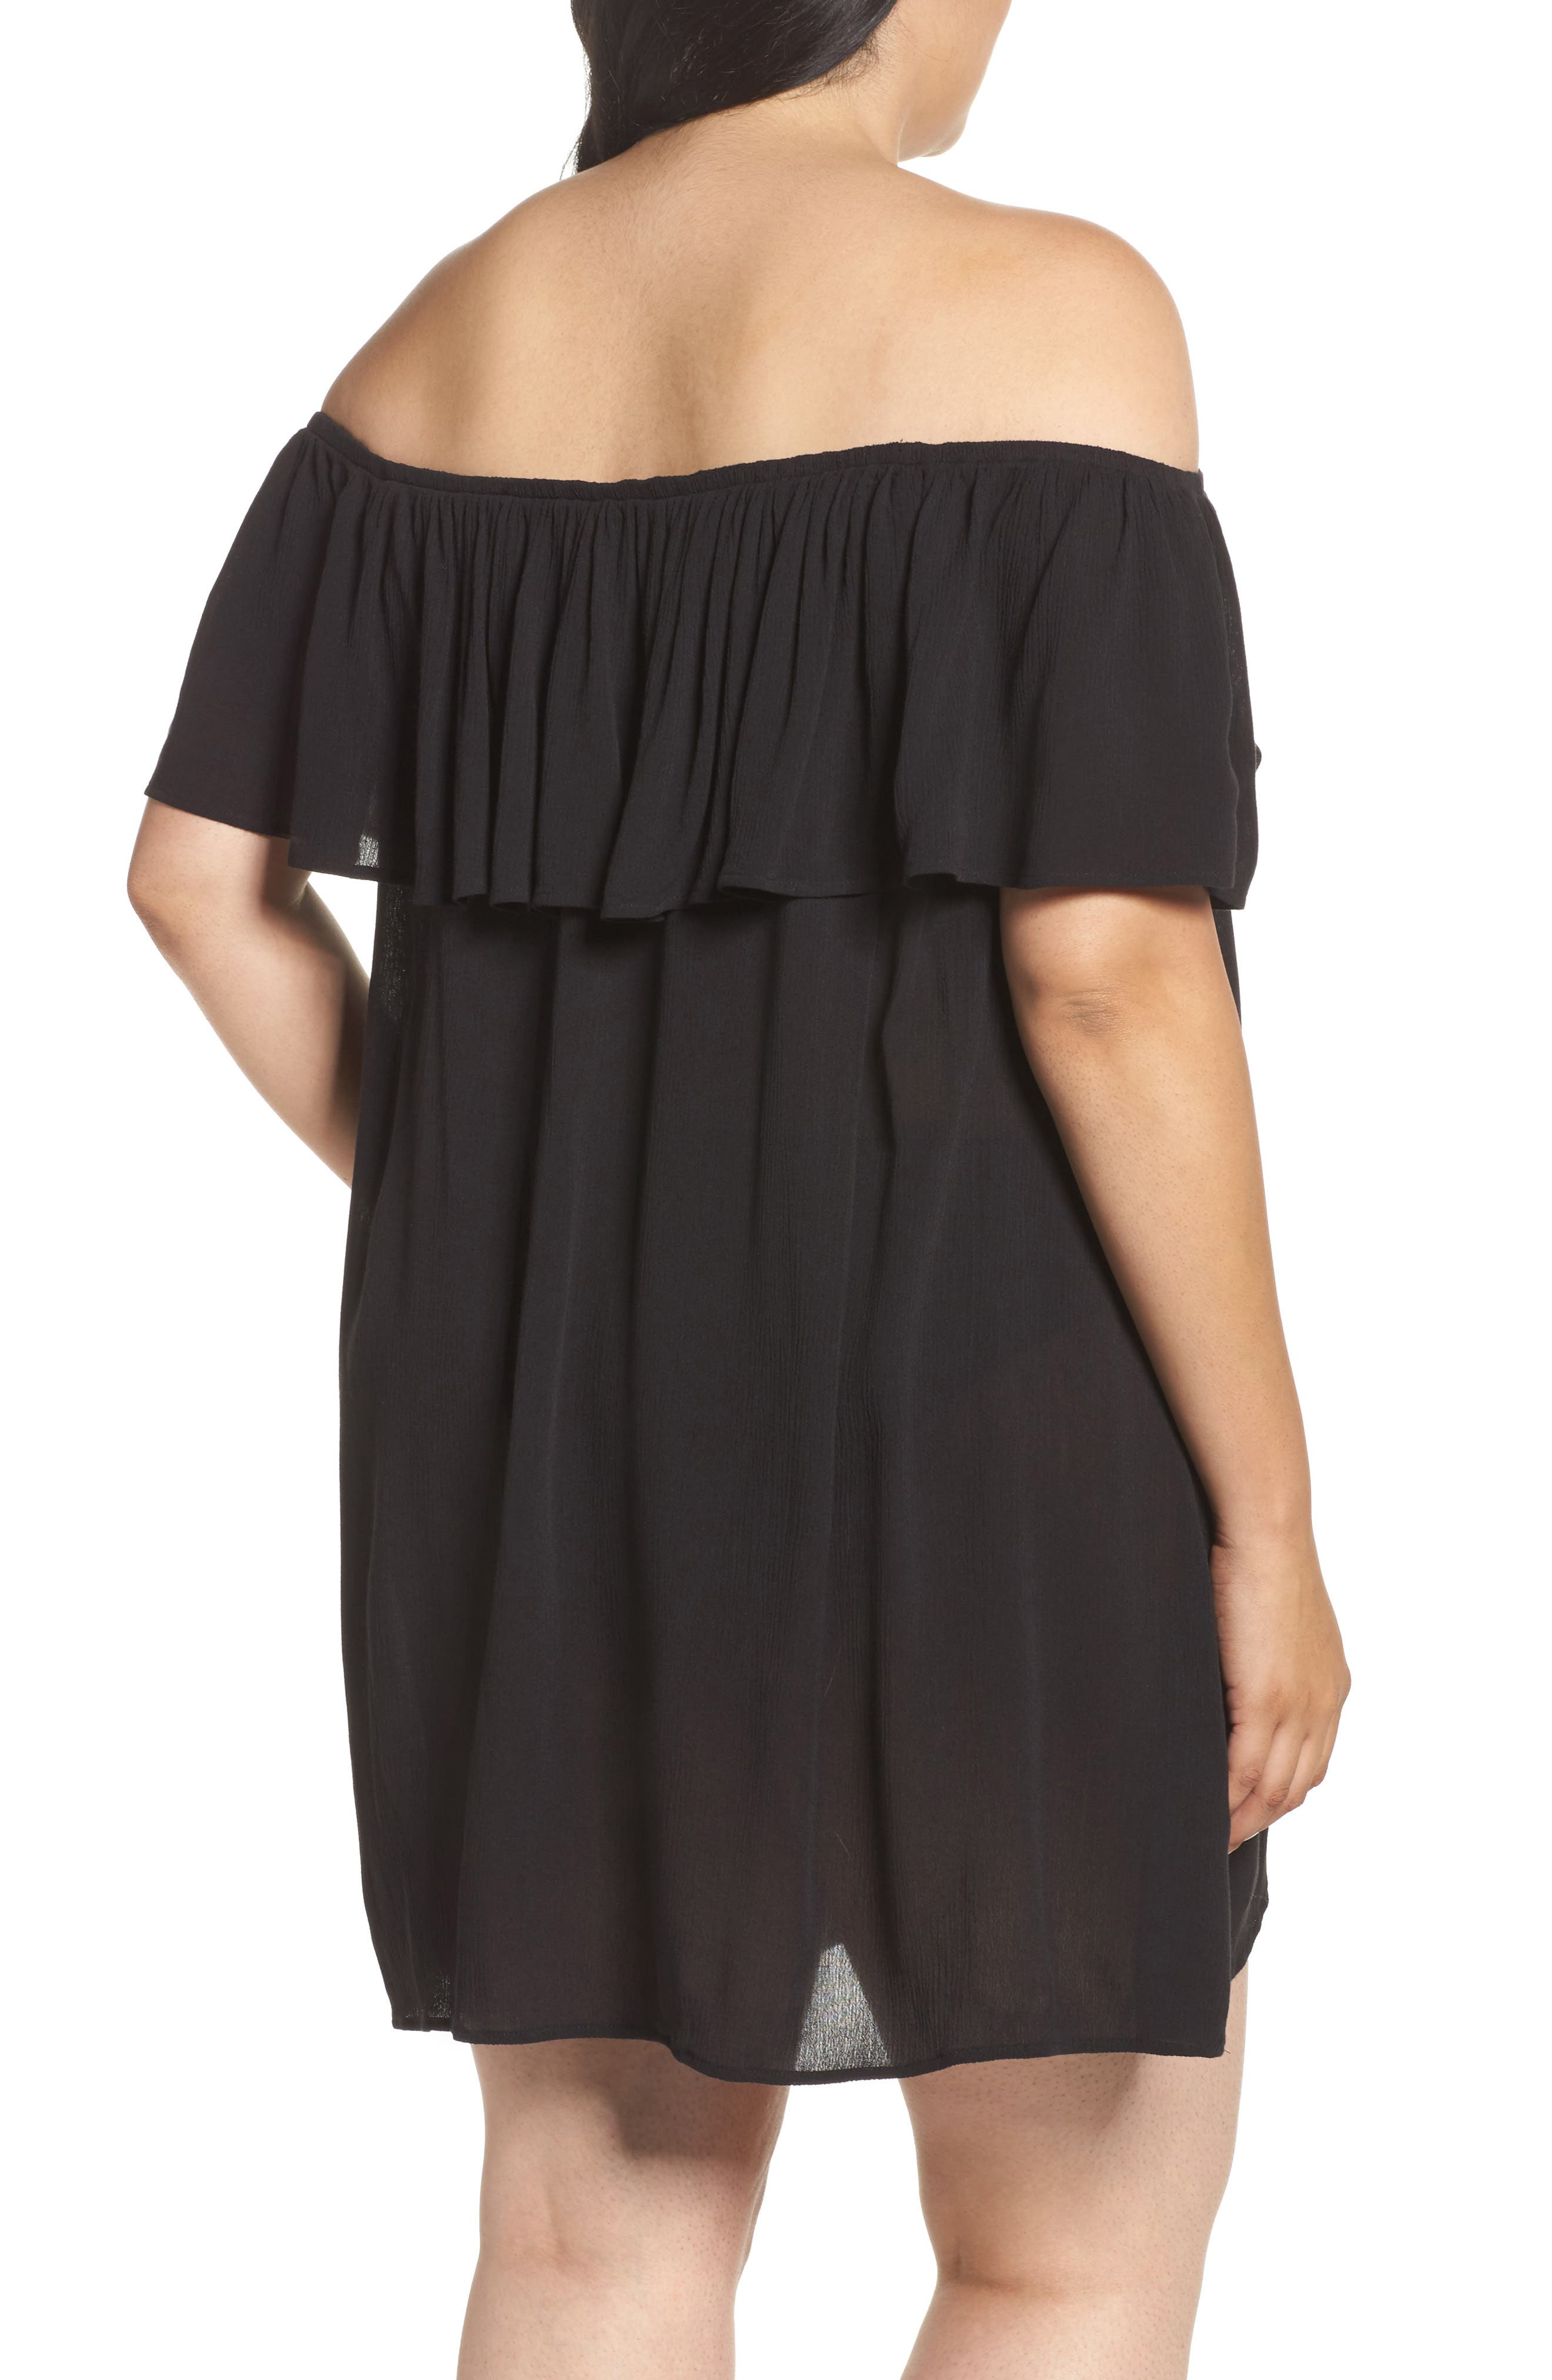 Alternate Image 2  - Becca Etc. Southern Belle Off the Shoulder Cover-Up Dress (Plus Size)